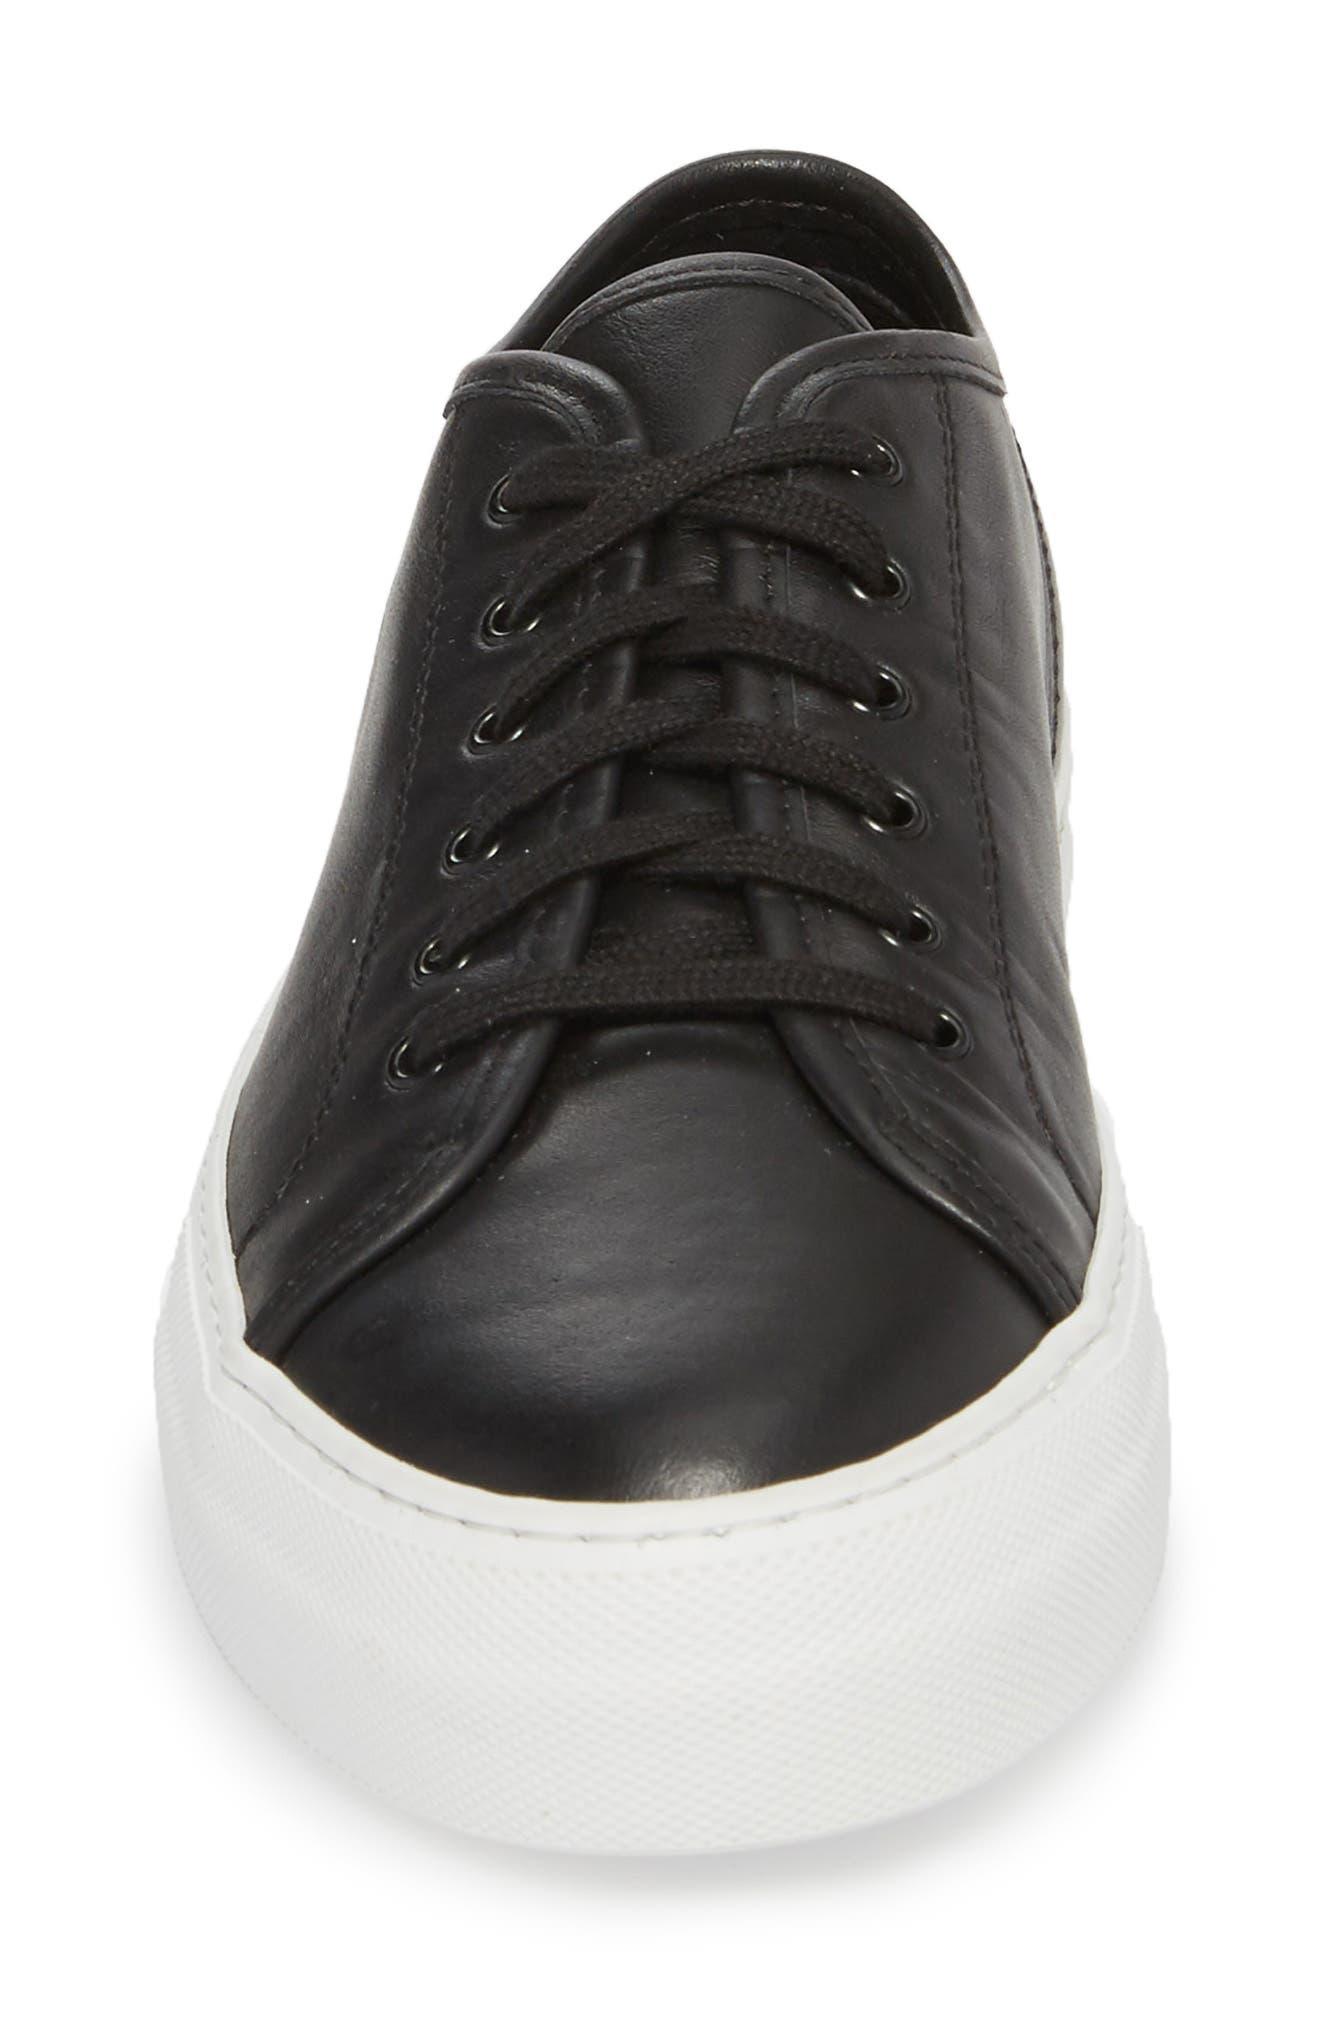 COMMON PROJECTS, Tournament Low Top Sneaker, Alternate thumbnail 4, color, BLACK